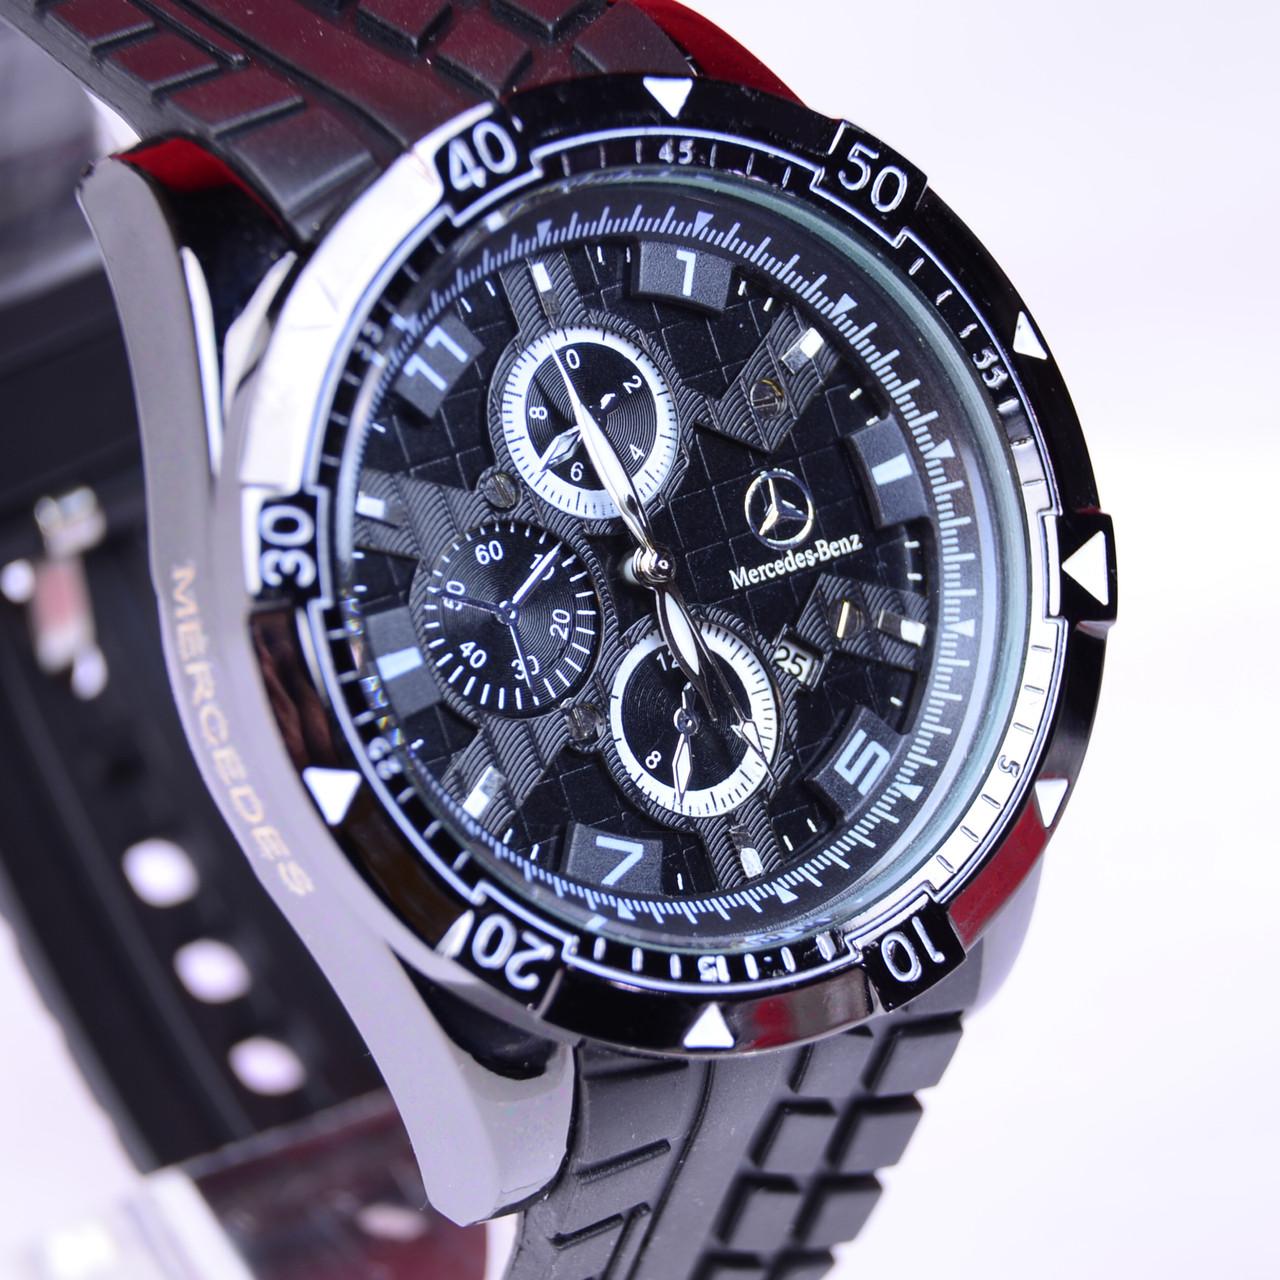 634b7a721bf5 Мужские наручные часы Merсedes Benz B187 кварц календарь: продажа, цена в  Николаеве. часы ...